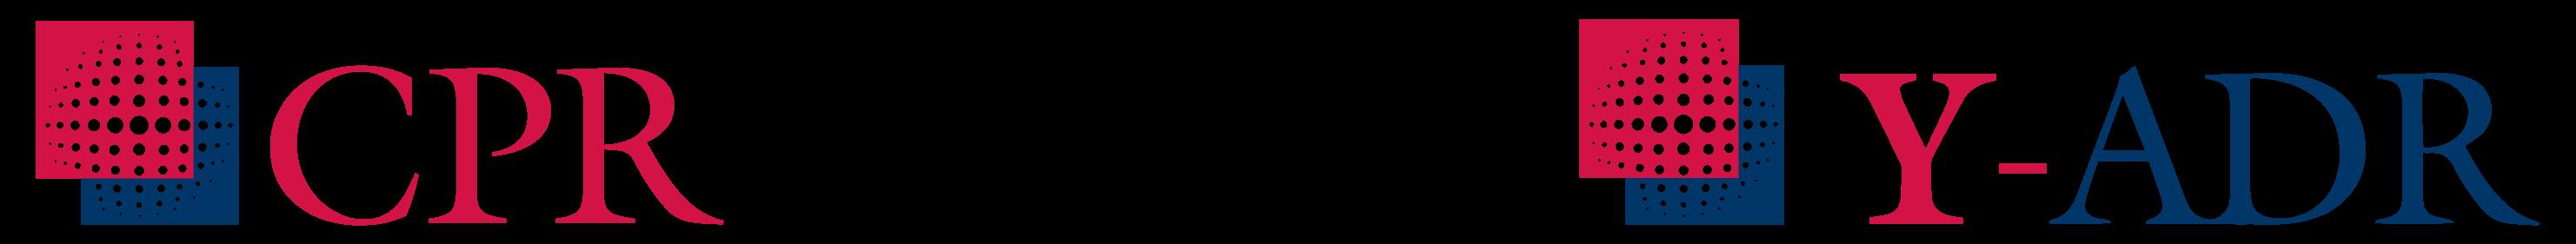 Alternative desc